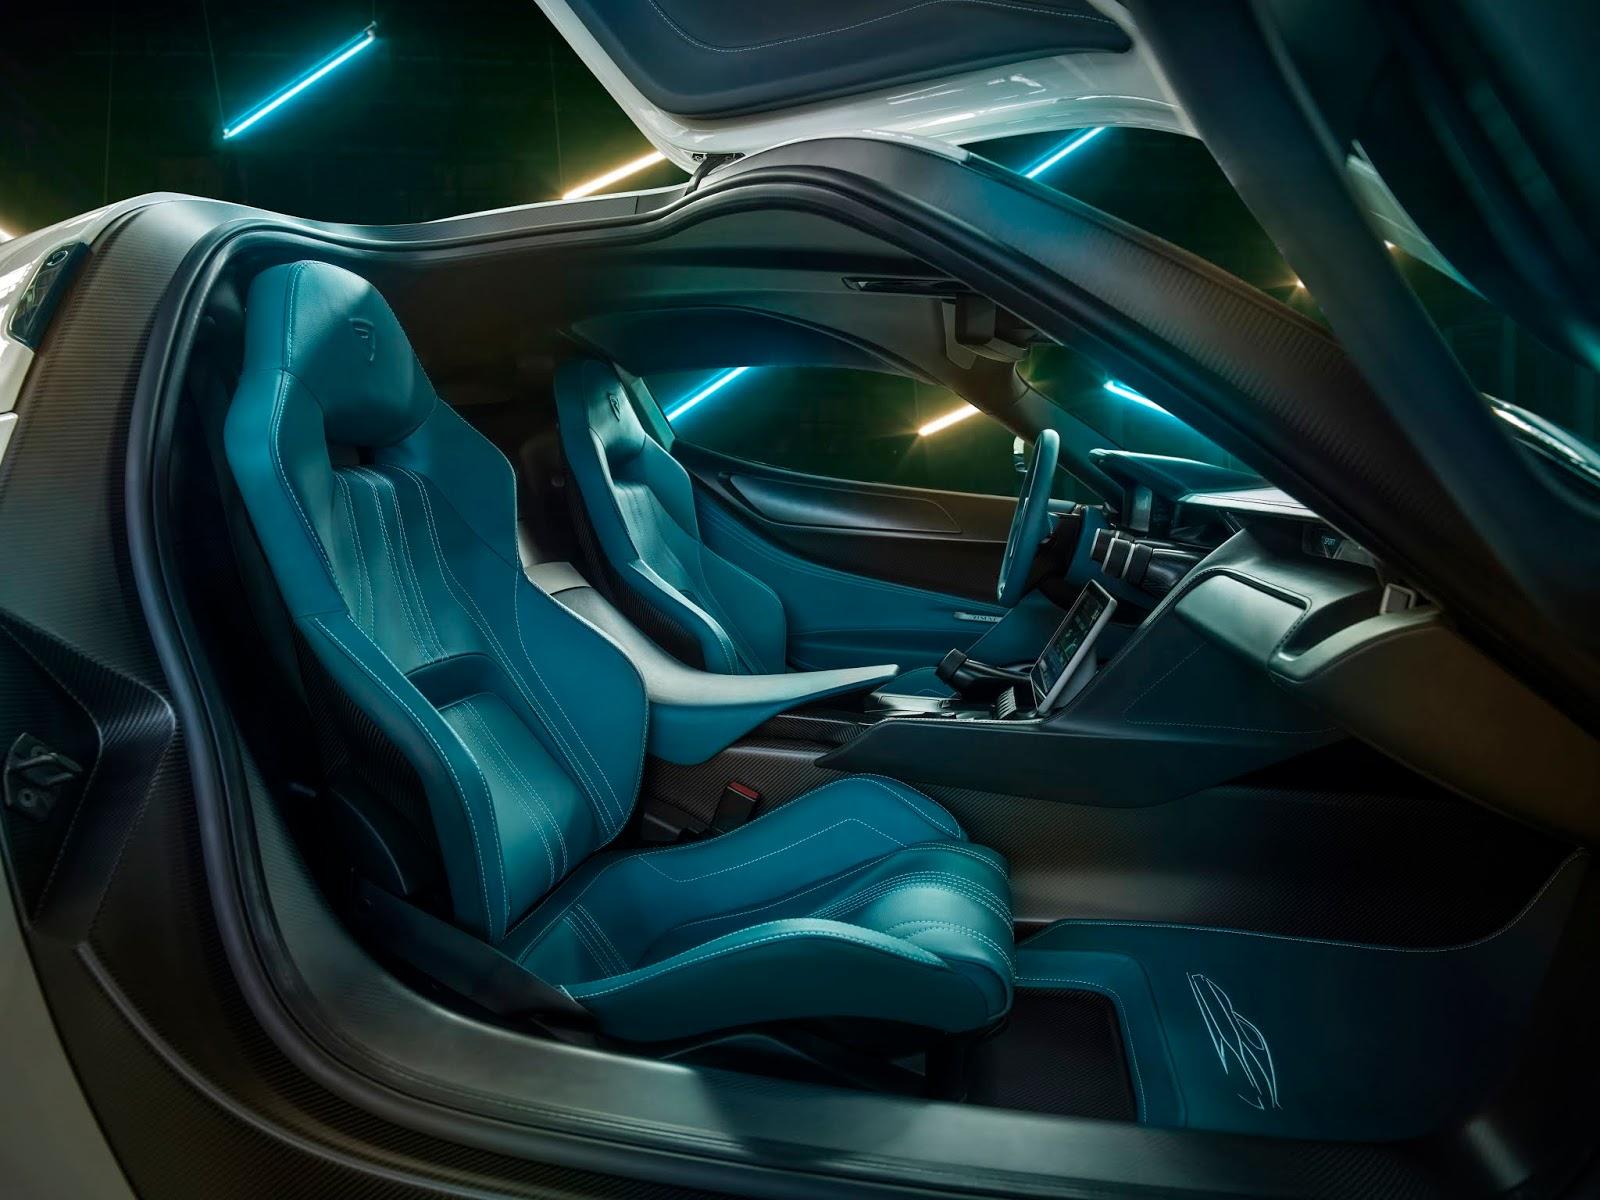 C TWO Interior PassengerSide Rimac C Two. Η νέα φυλή στα hypercars, έρχεται με 1900 ίππους. C Two, Electric cars, hypercar, Rimac, zblog